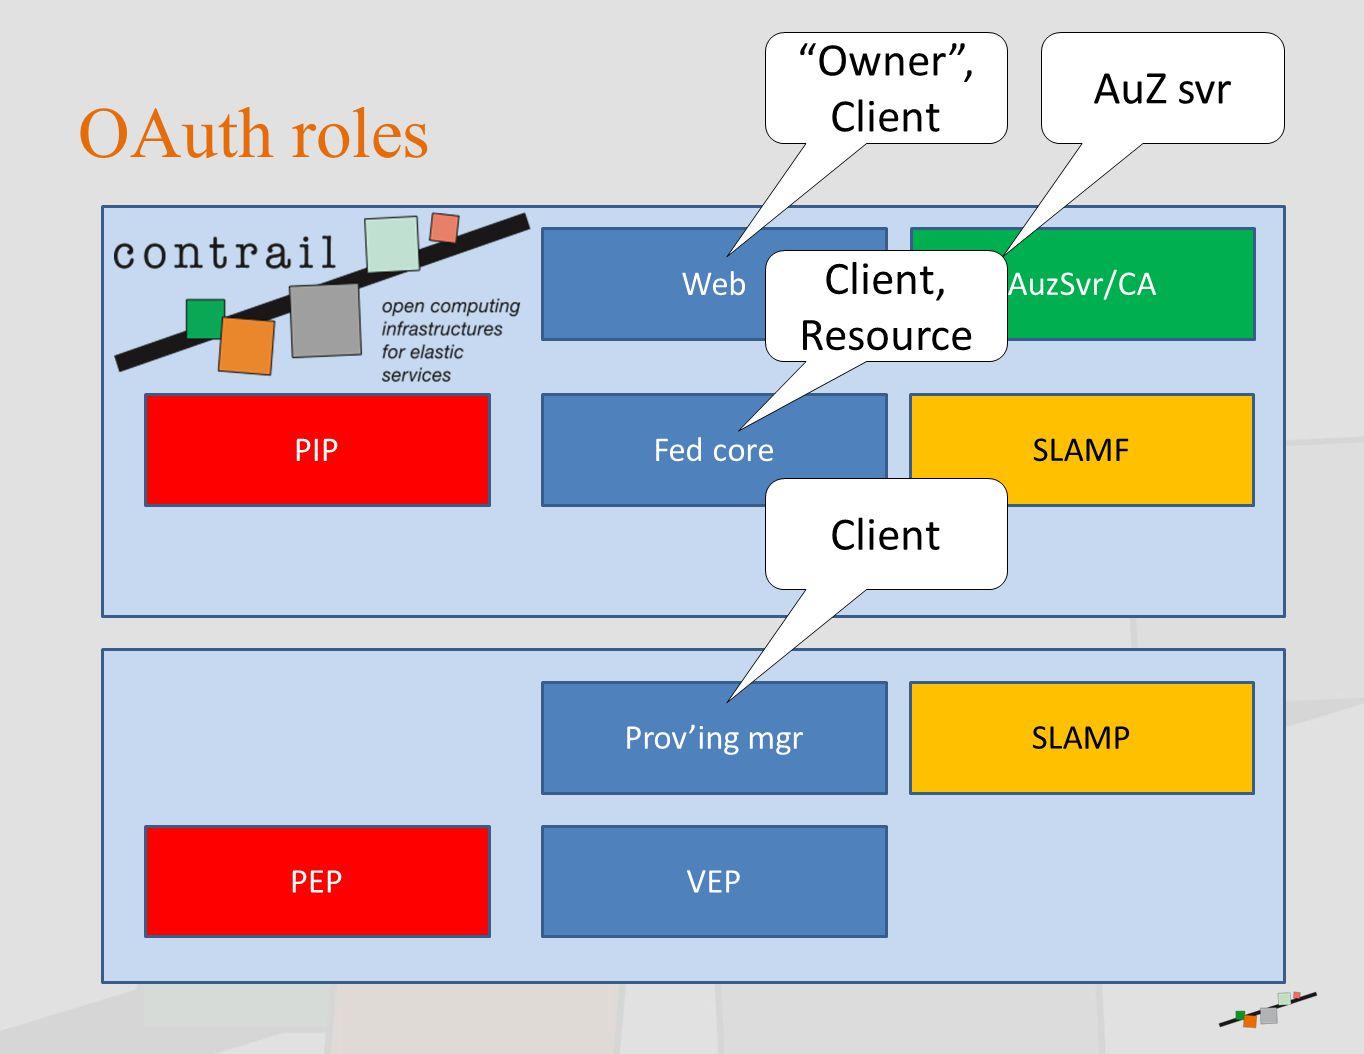 "OAuth roles Web Fed core Prov'ing mgr VEP SLAMF SLAMP AuzSvr/CA PEP PIP ""Owner"", Client AuZ svr Client Client, Resource"